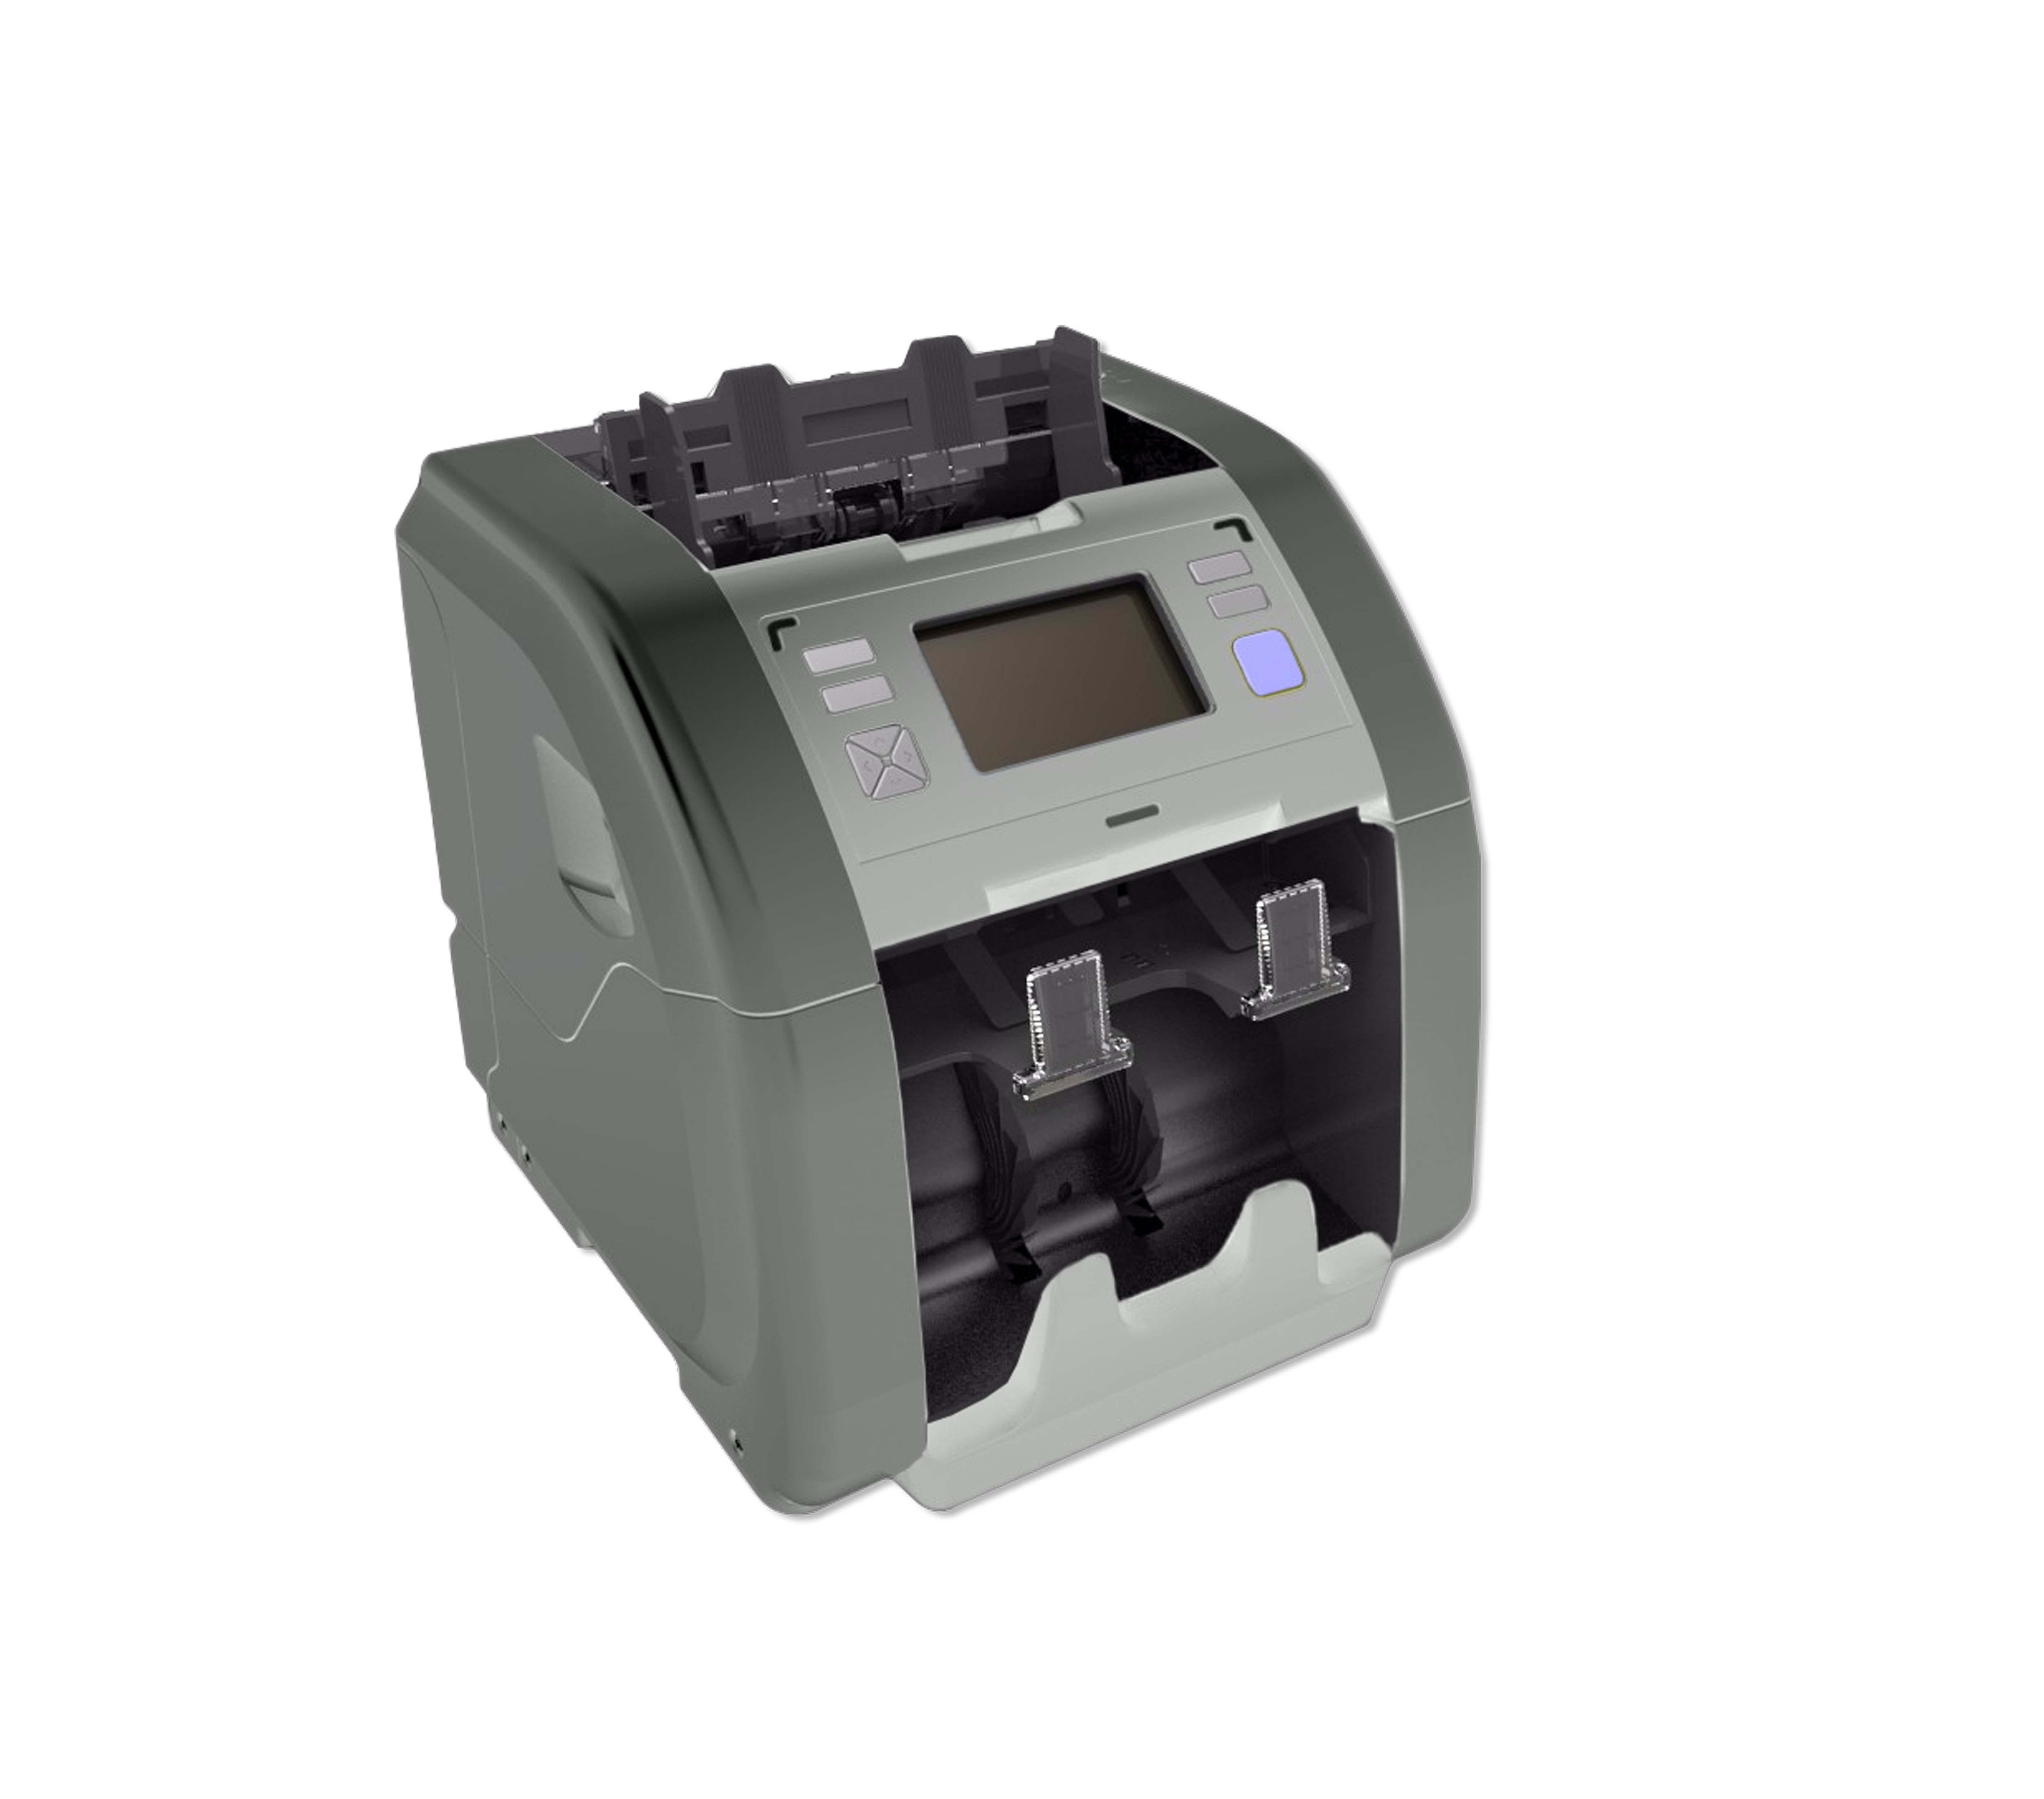 Multi Cash iH-110 - Banknotenzähler